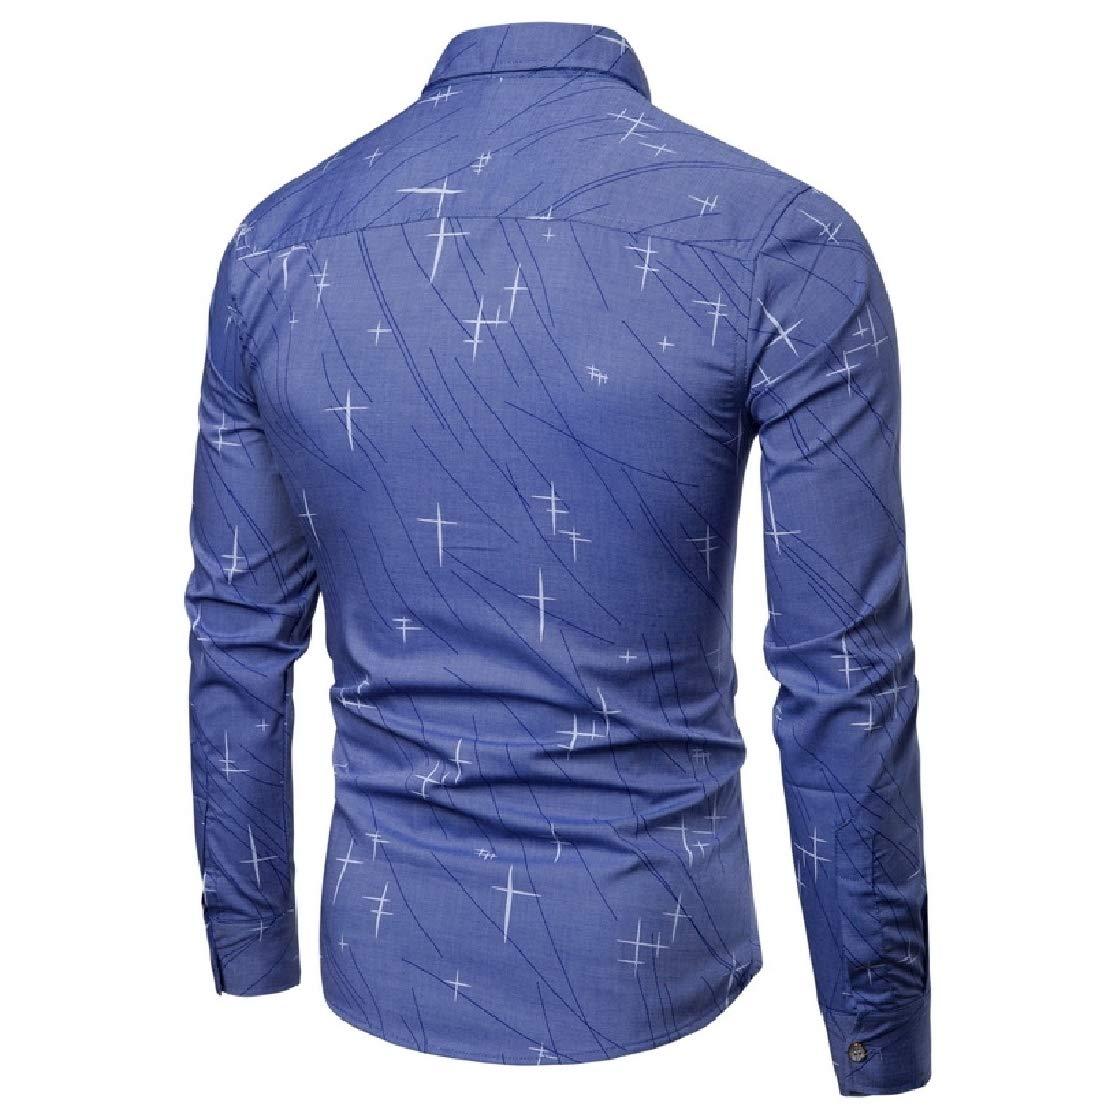 YUNY Mens Comfort Long-Sleeved Business Print Dress Shirt Dark Blue L